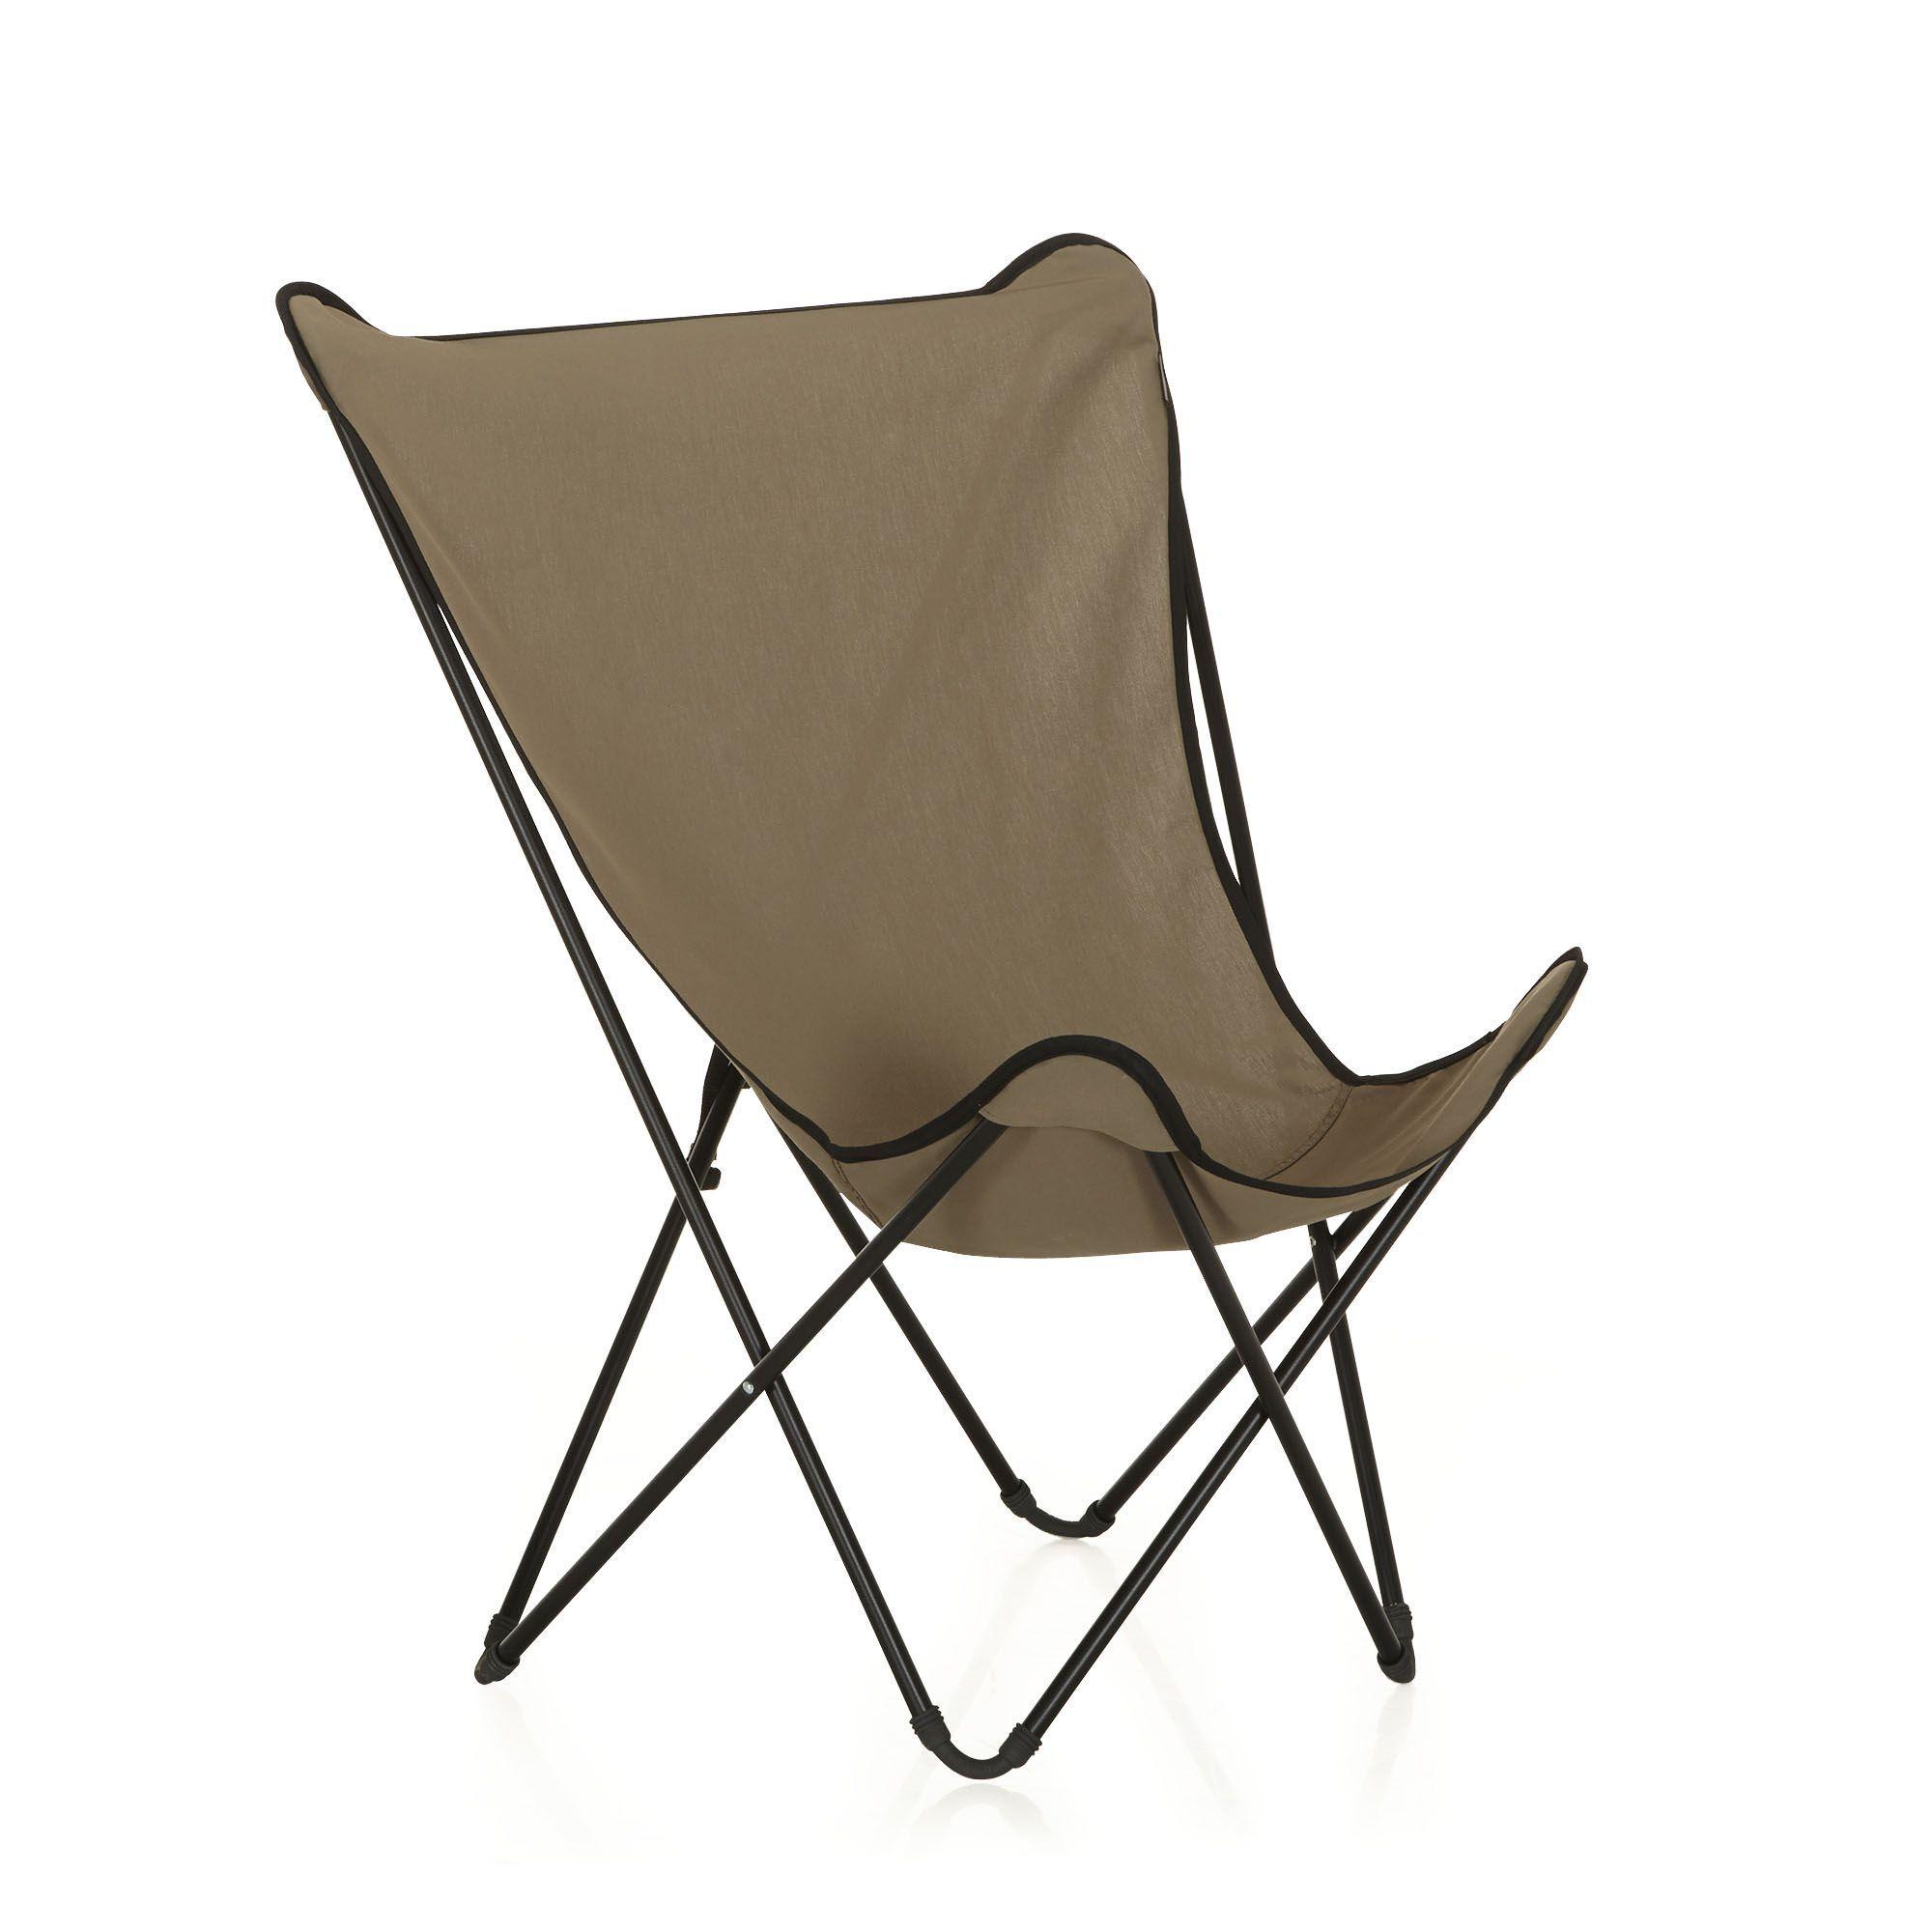 lafuma pop up chair design online fauteuil de repos pliant beige maxi